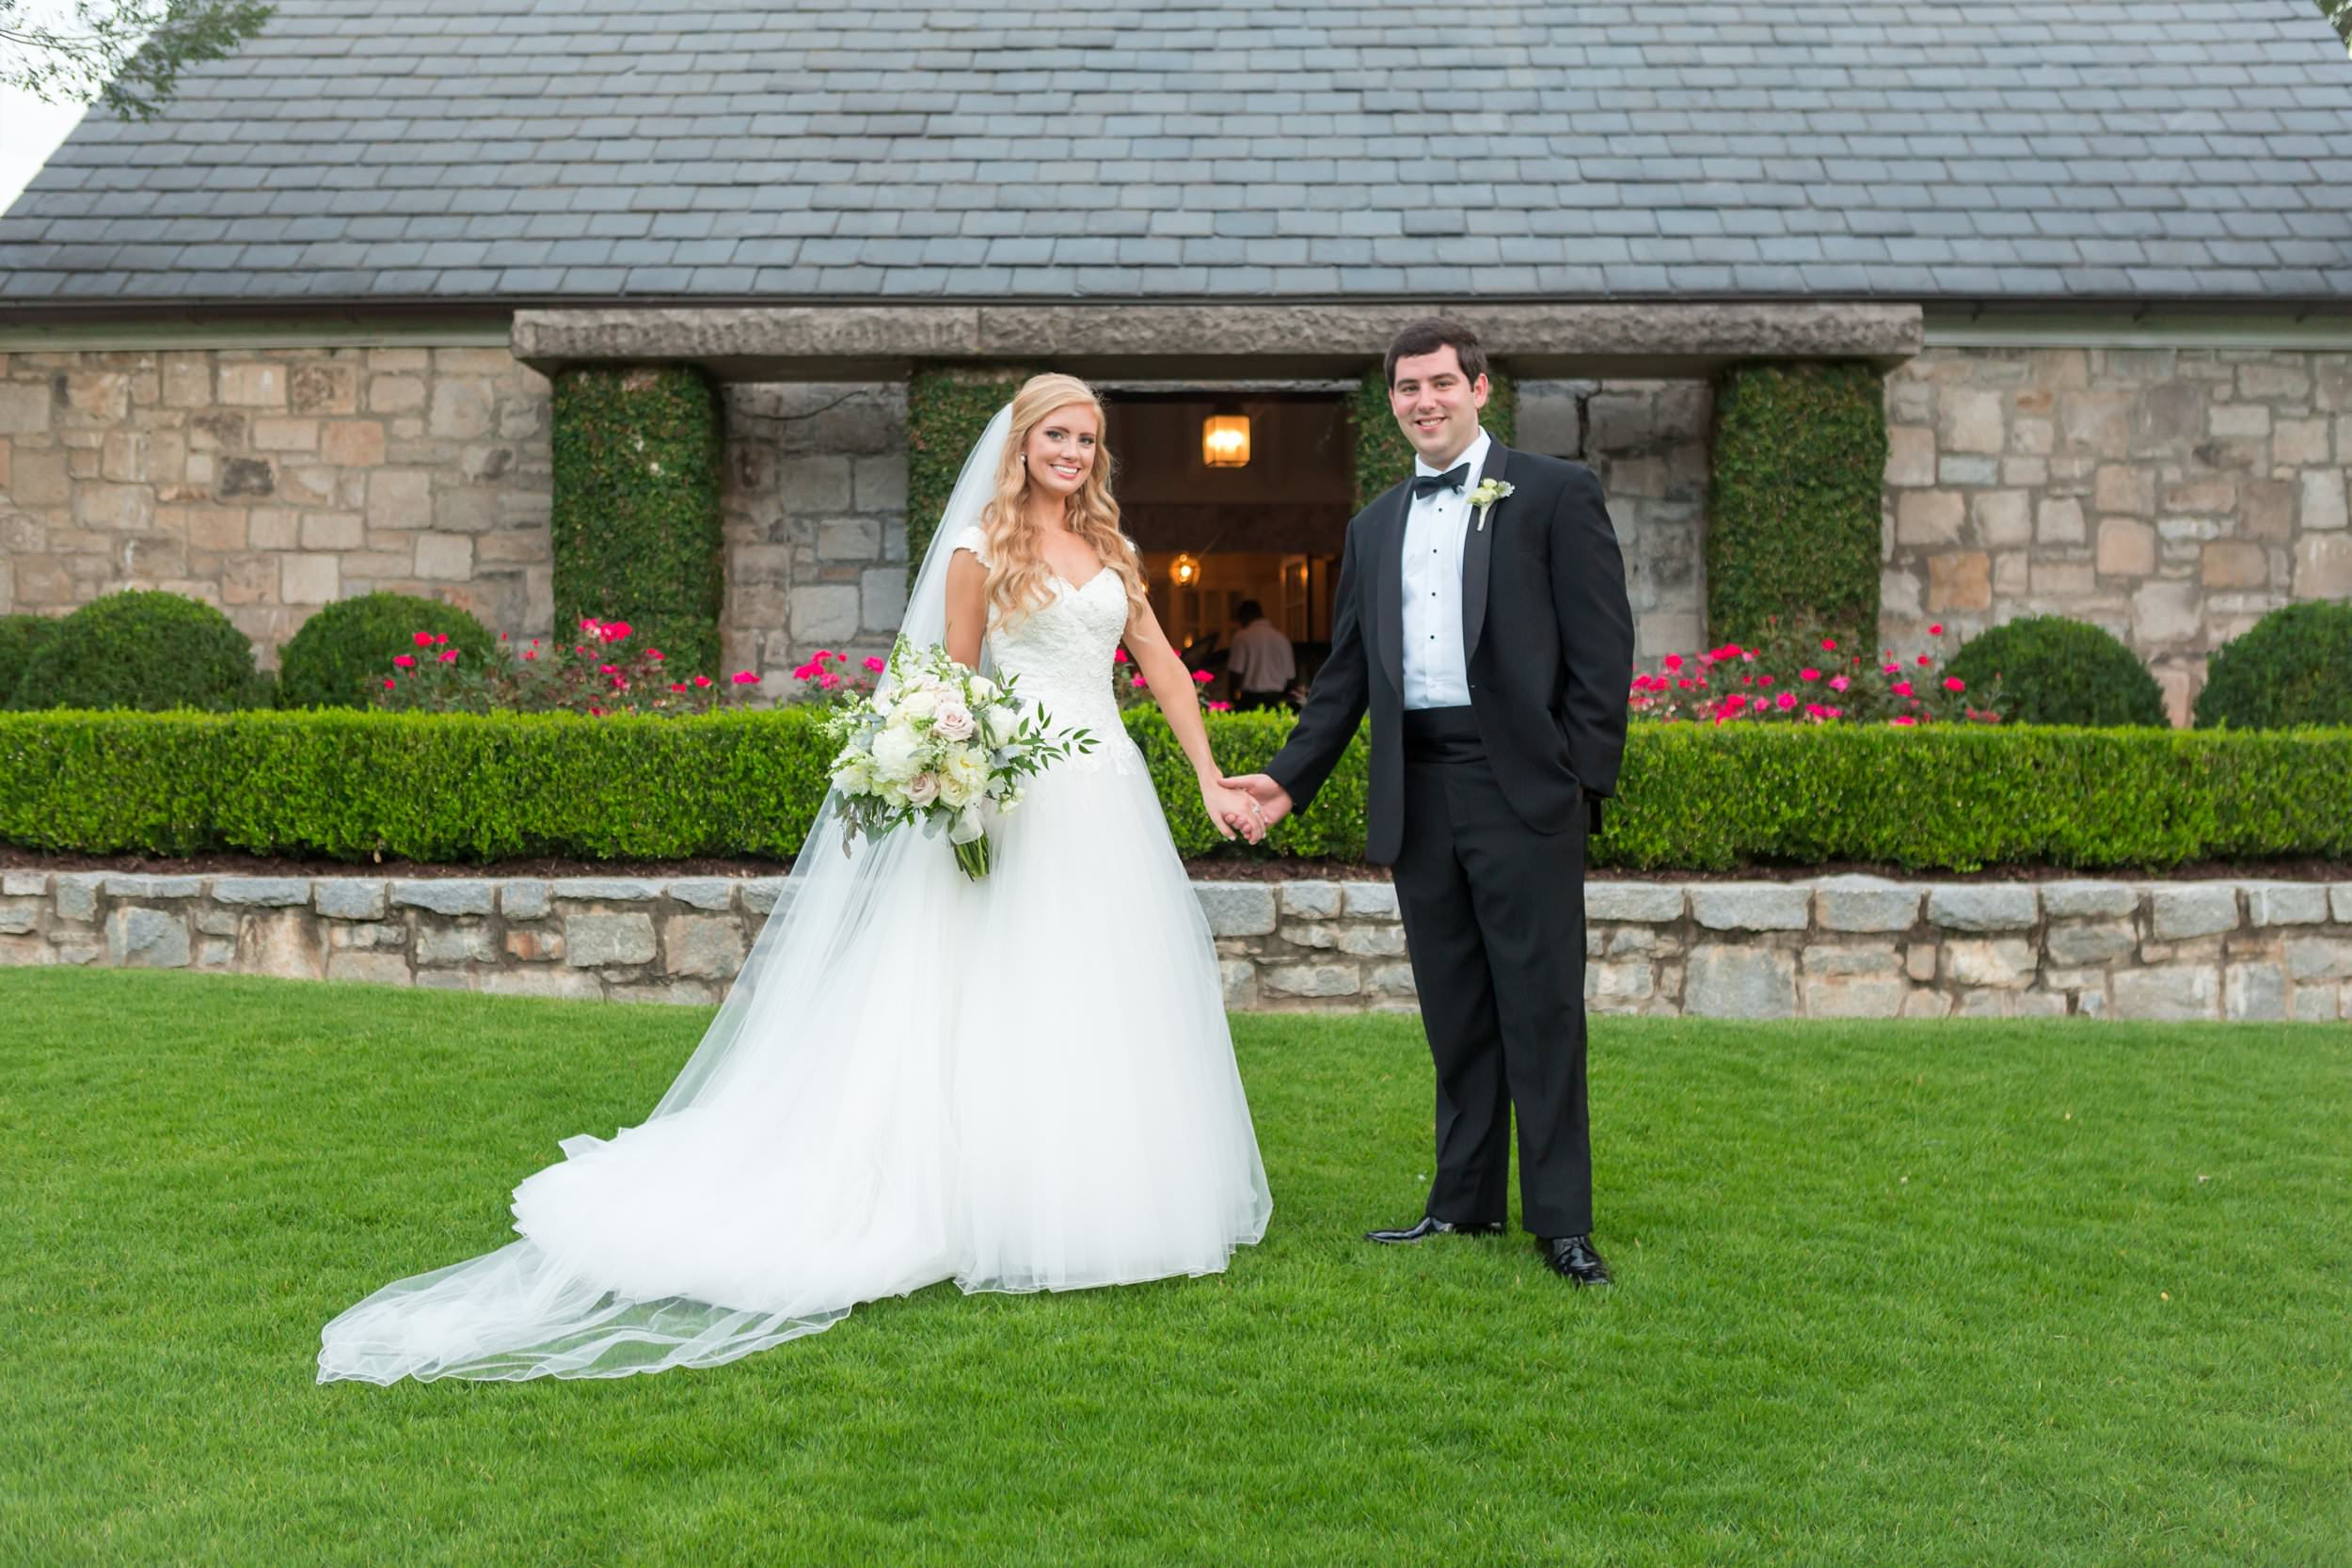 Piedmont-Driving-Club-Wedding-Photos036.jpg